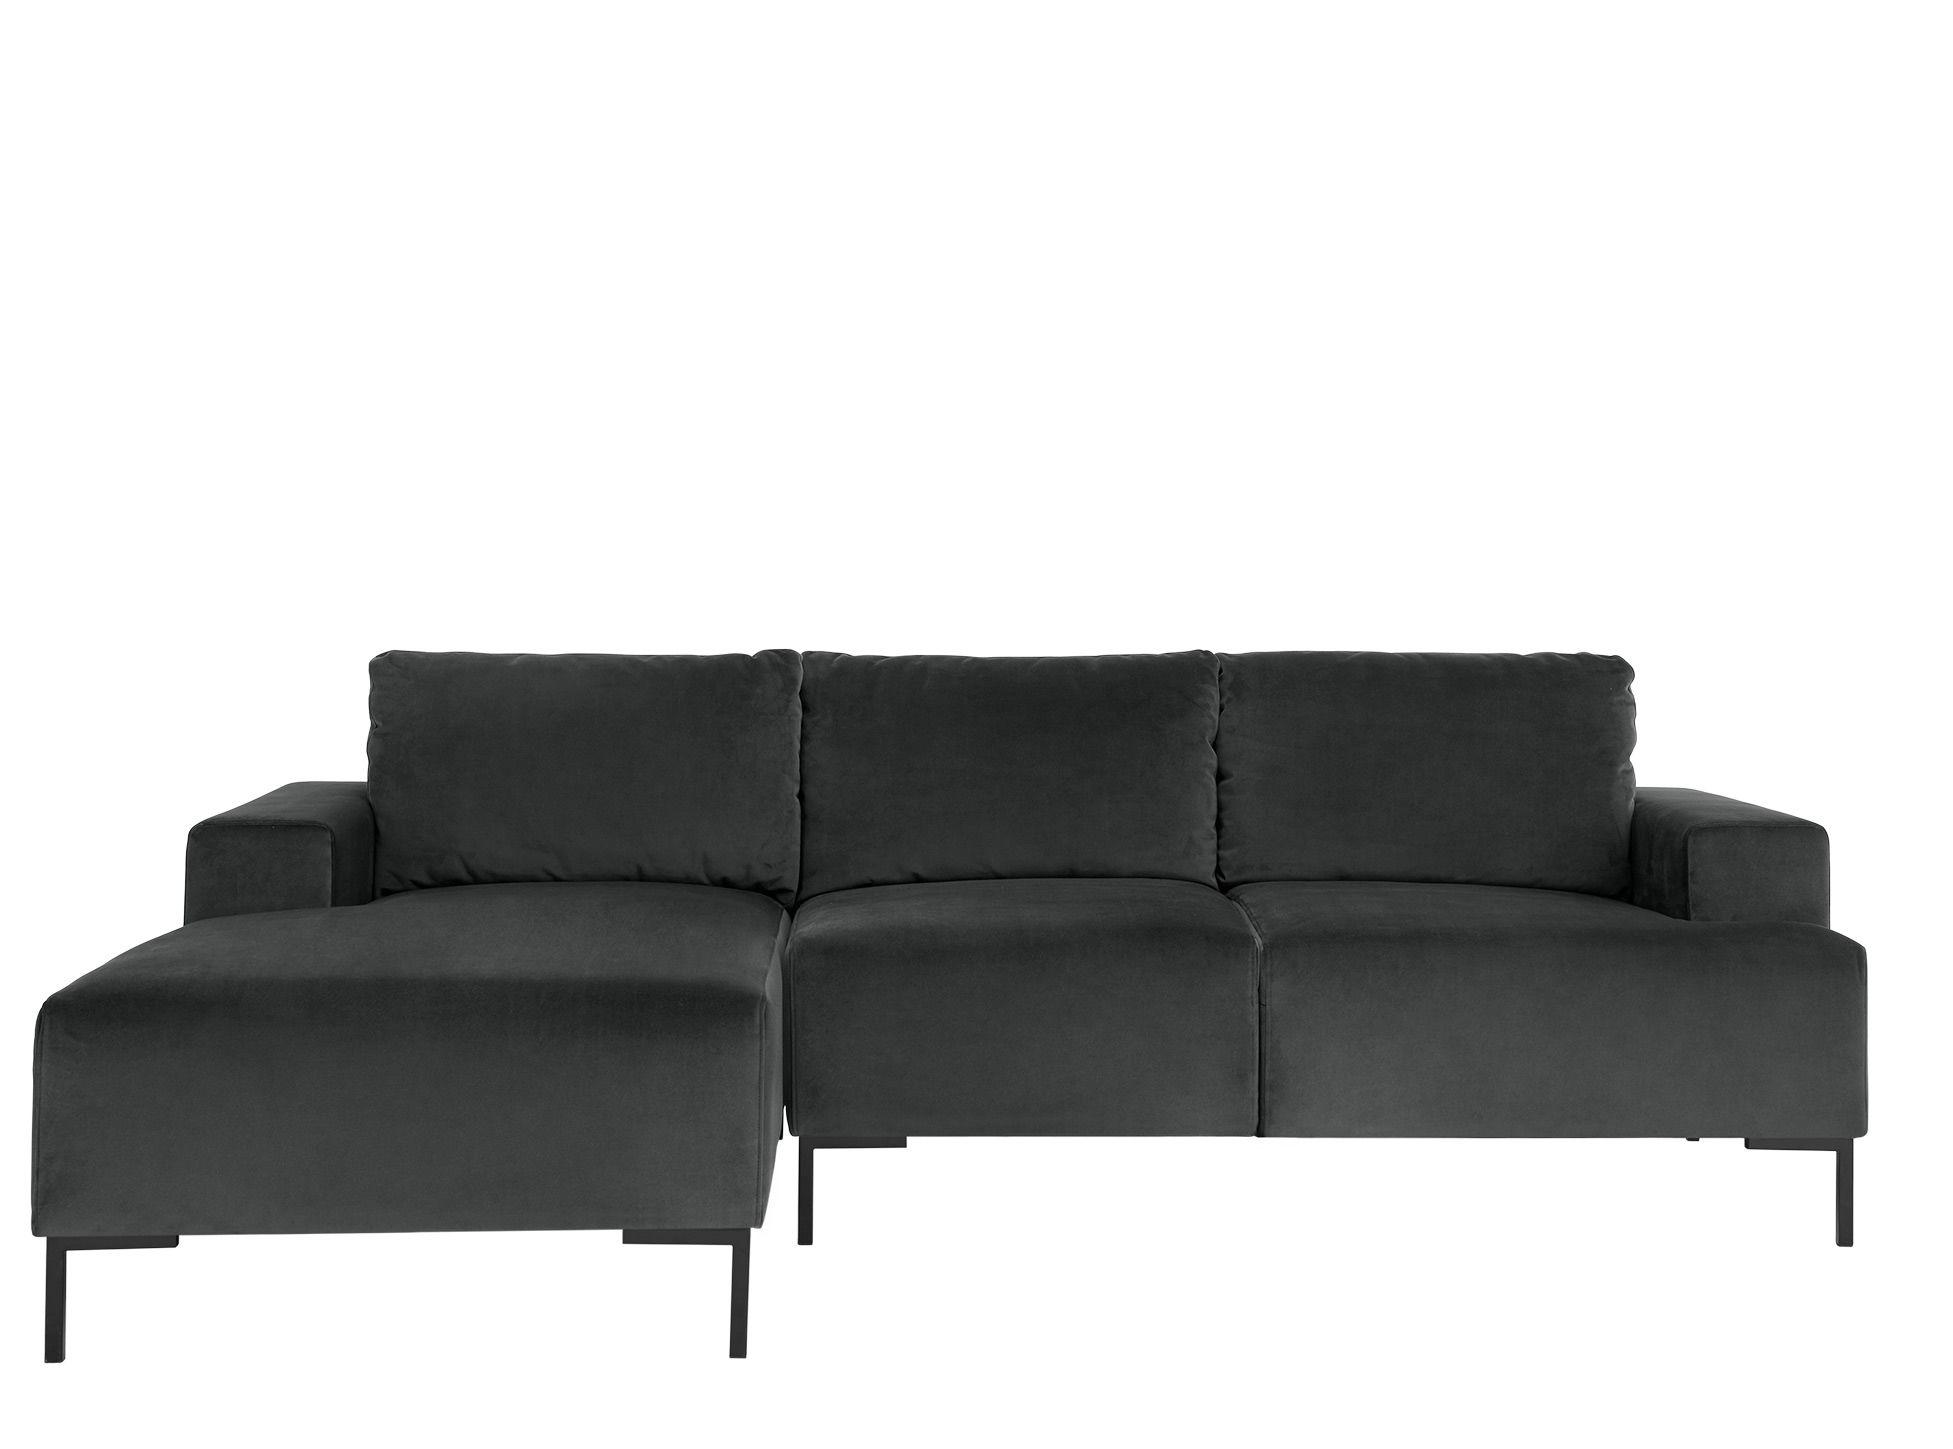 Frederik 3 Seater Left Hand Facing Compact Corner Chaise End Sofa Midnight Grey Velvet Corner Sofa Sofa Design How To Make Corner Sofa